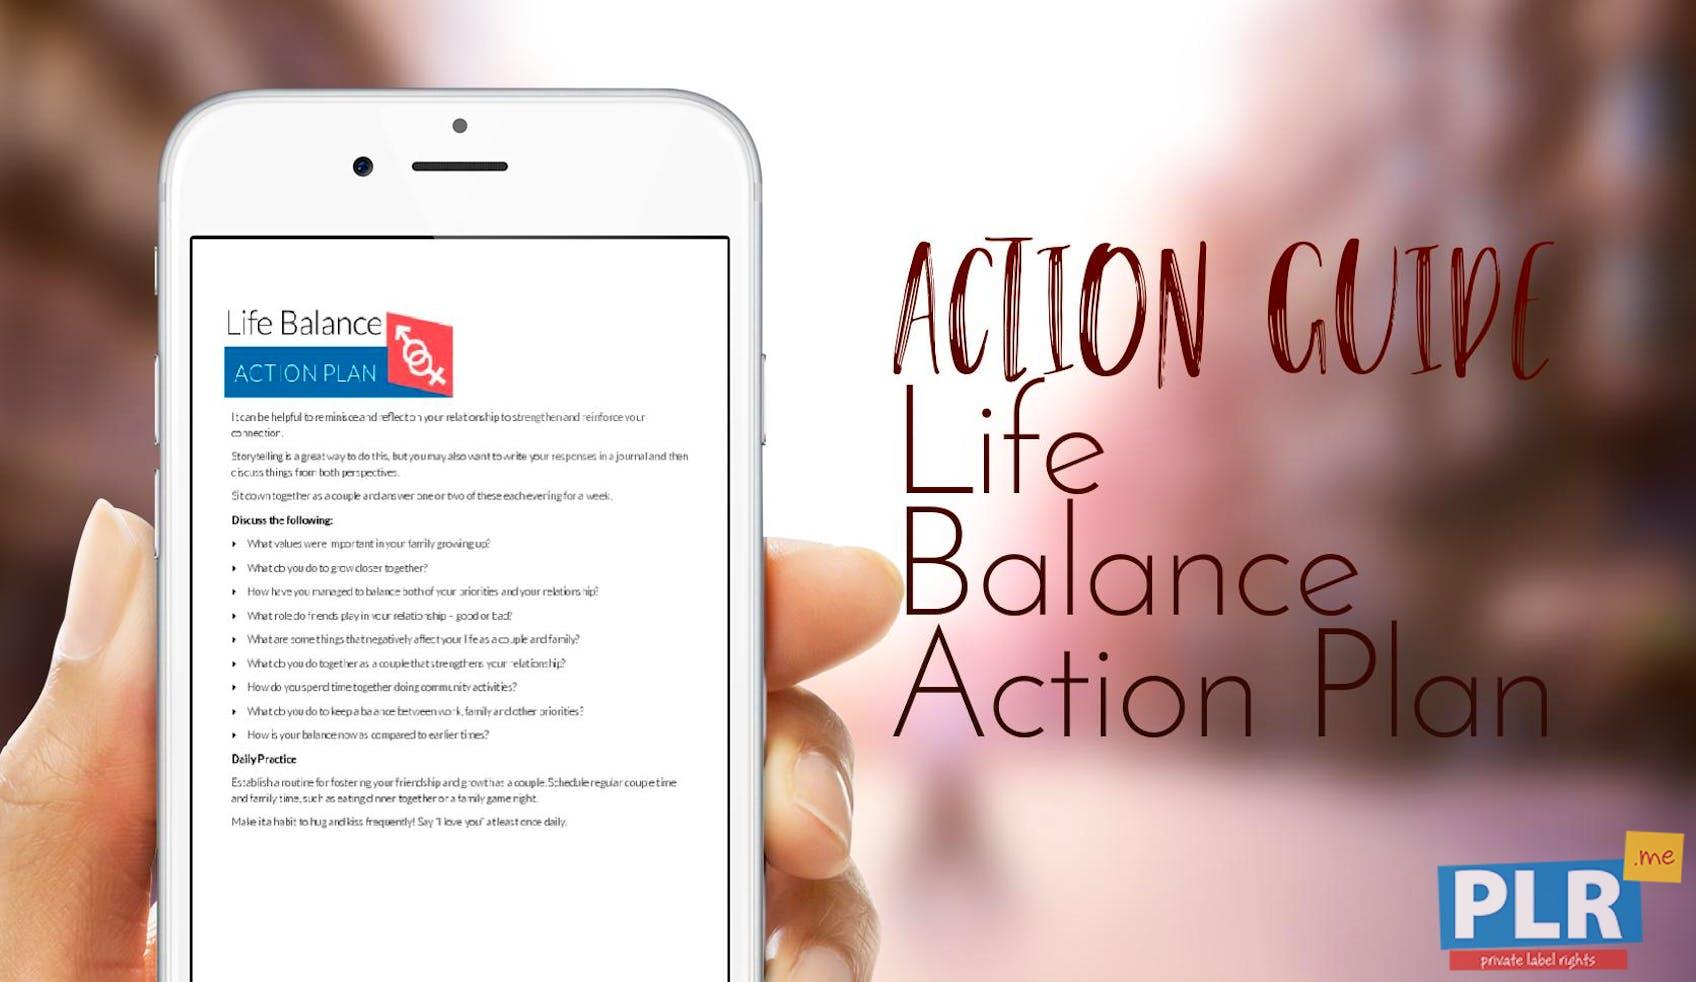 Life Balance Action Plan